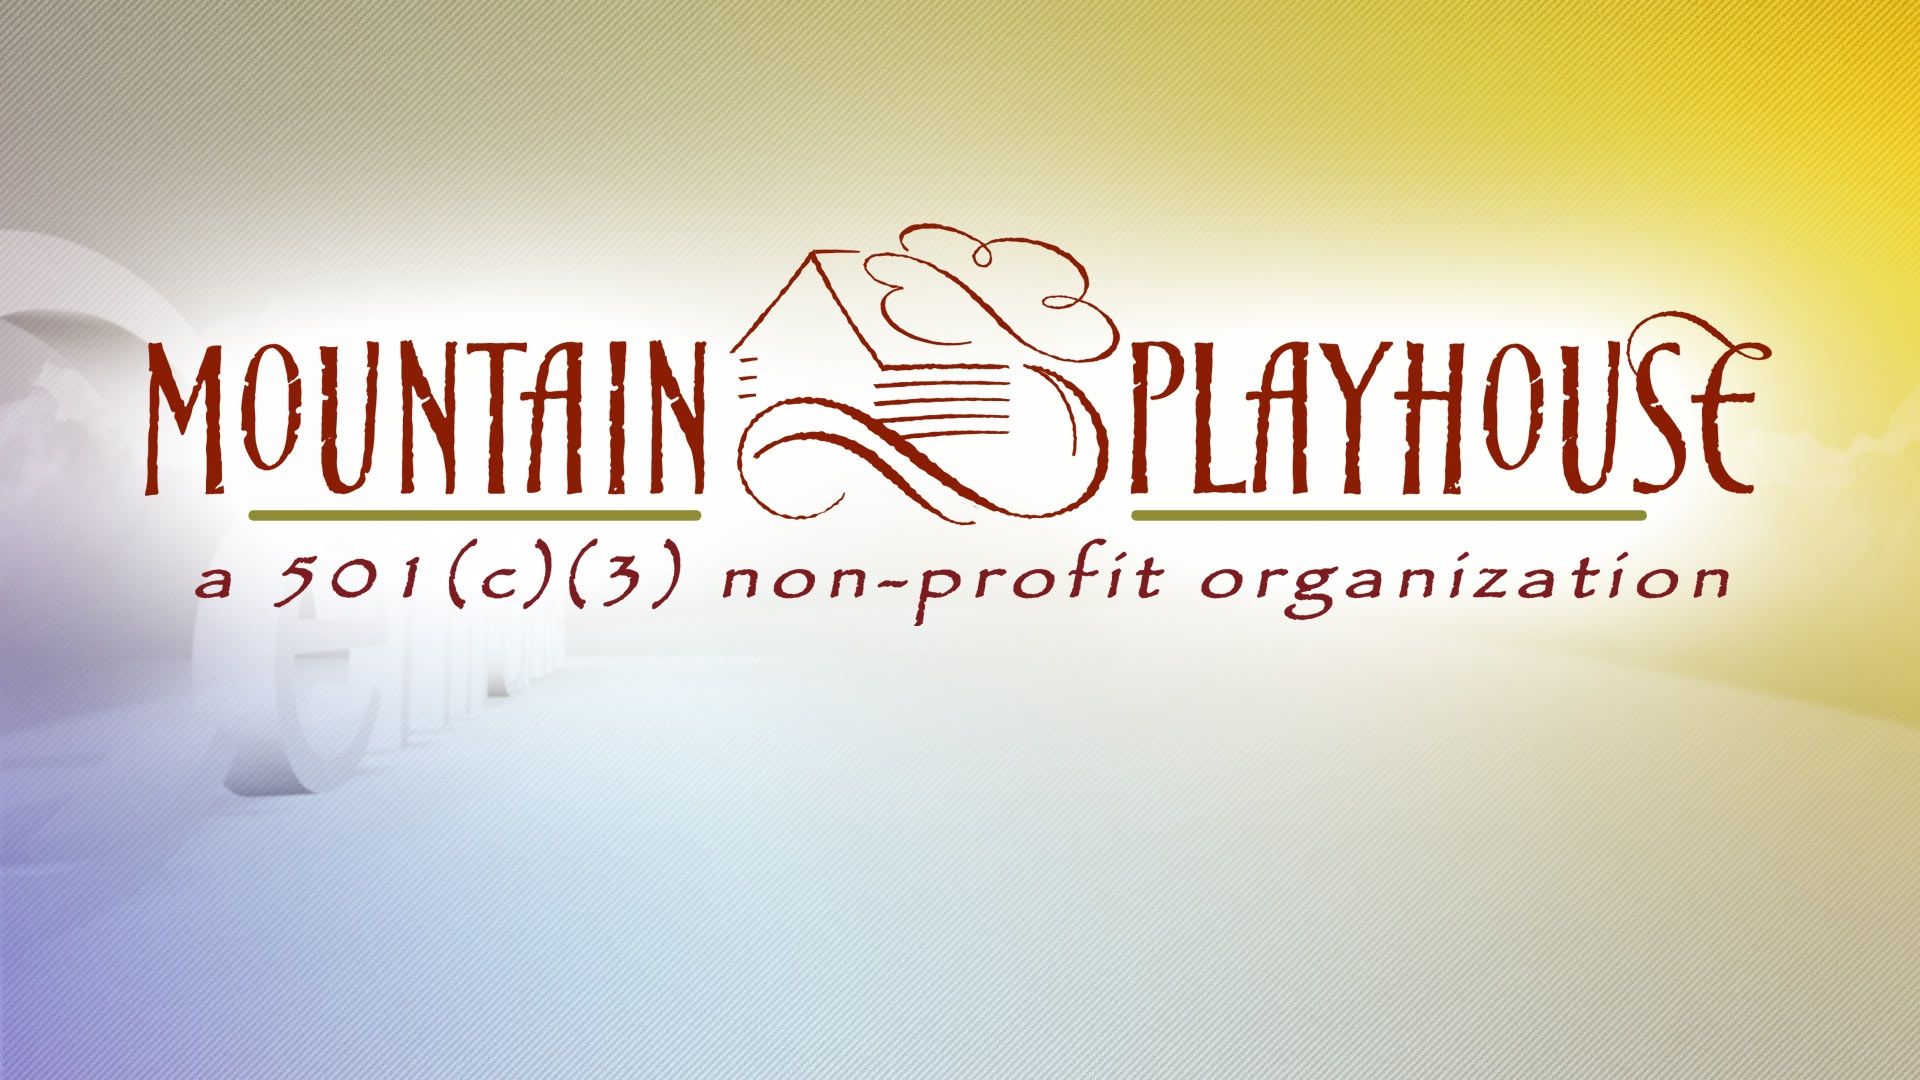 mountain playhouse_CPAL_1436898213389.JPG